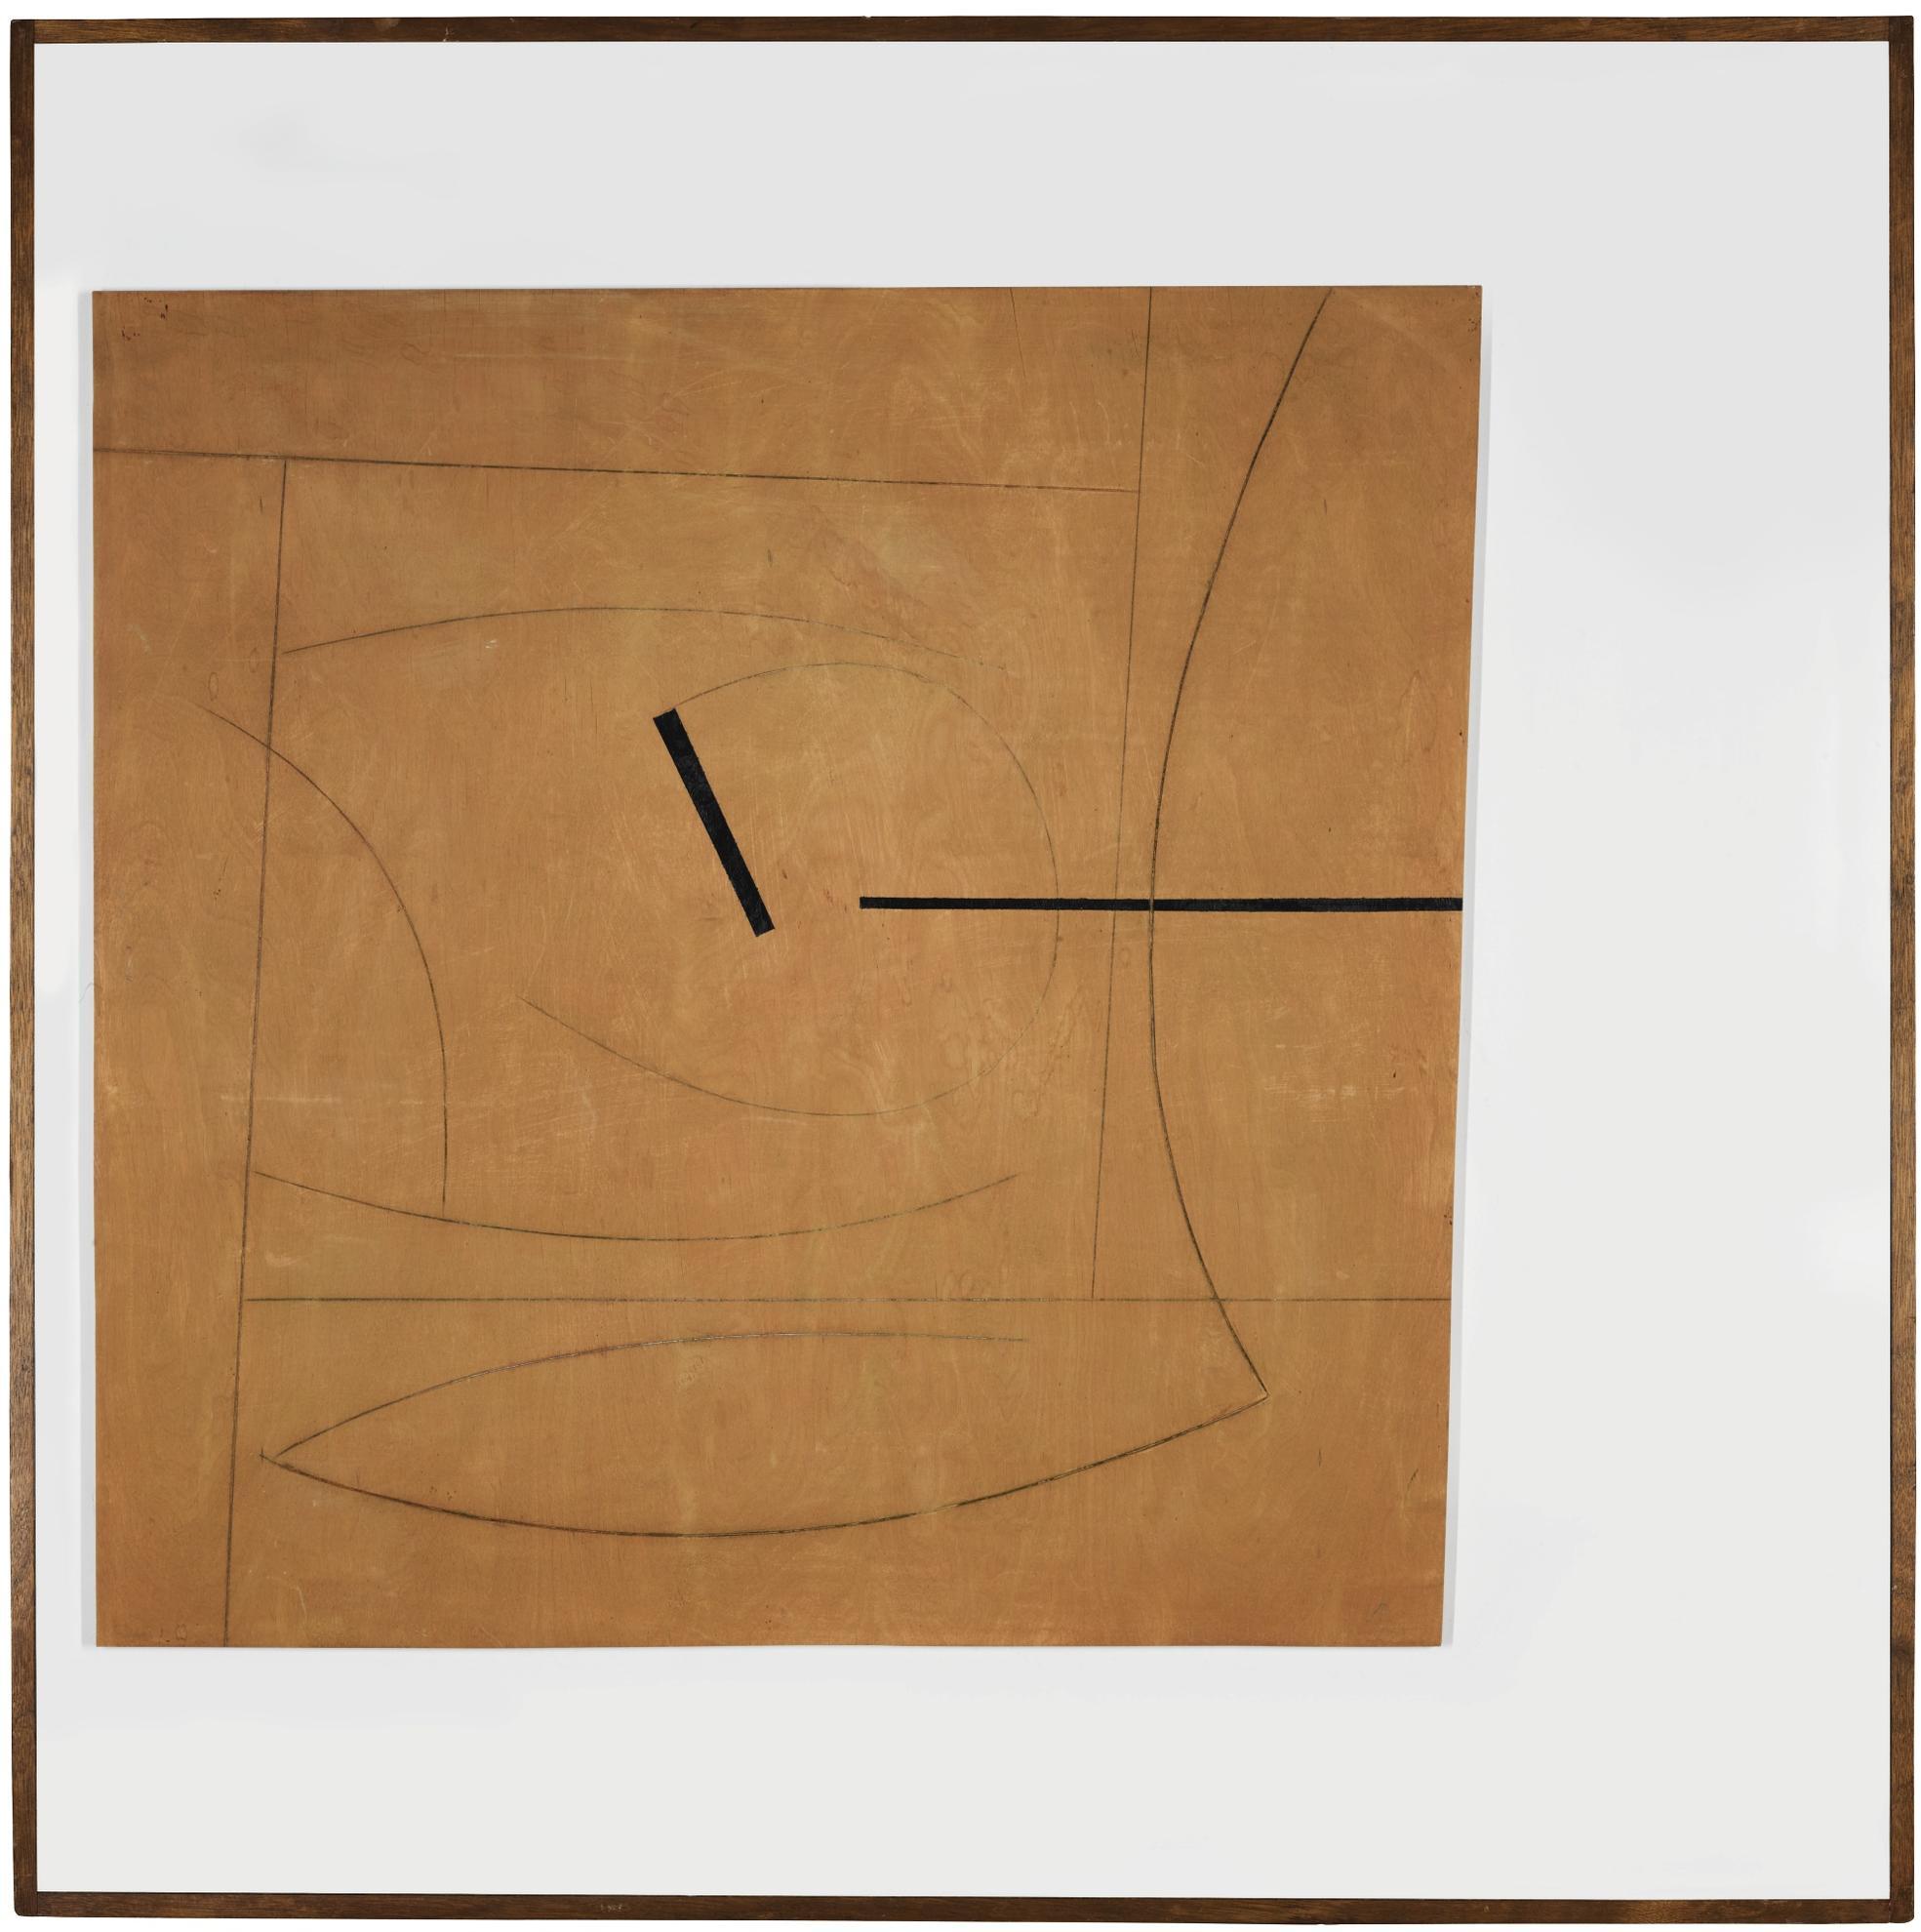 Victor Pasmore-Linear Motif-1961